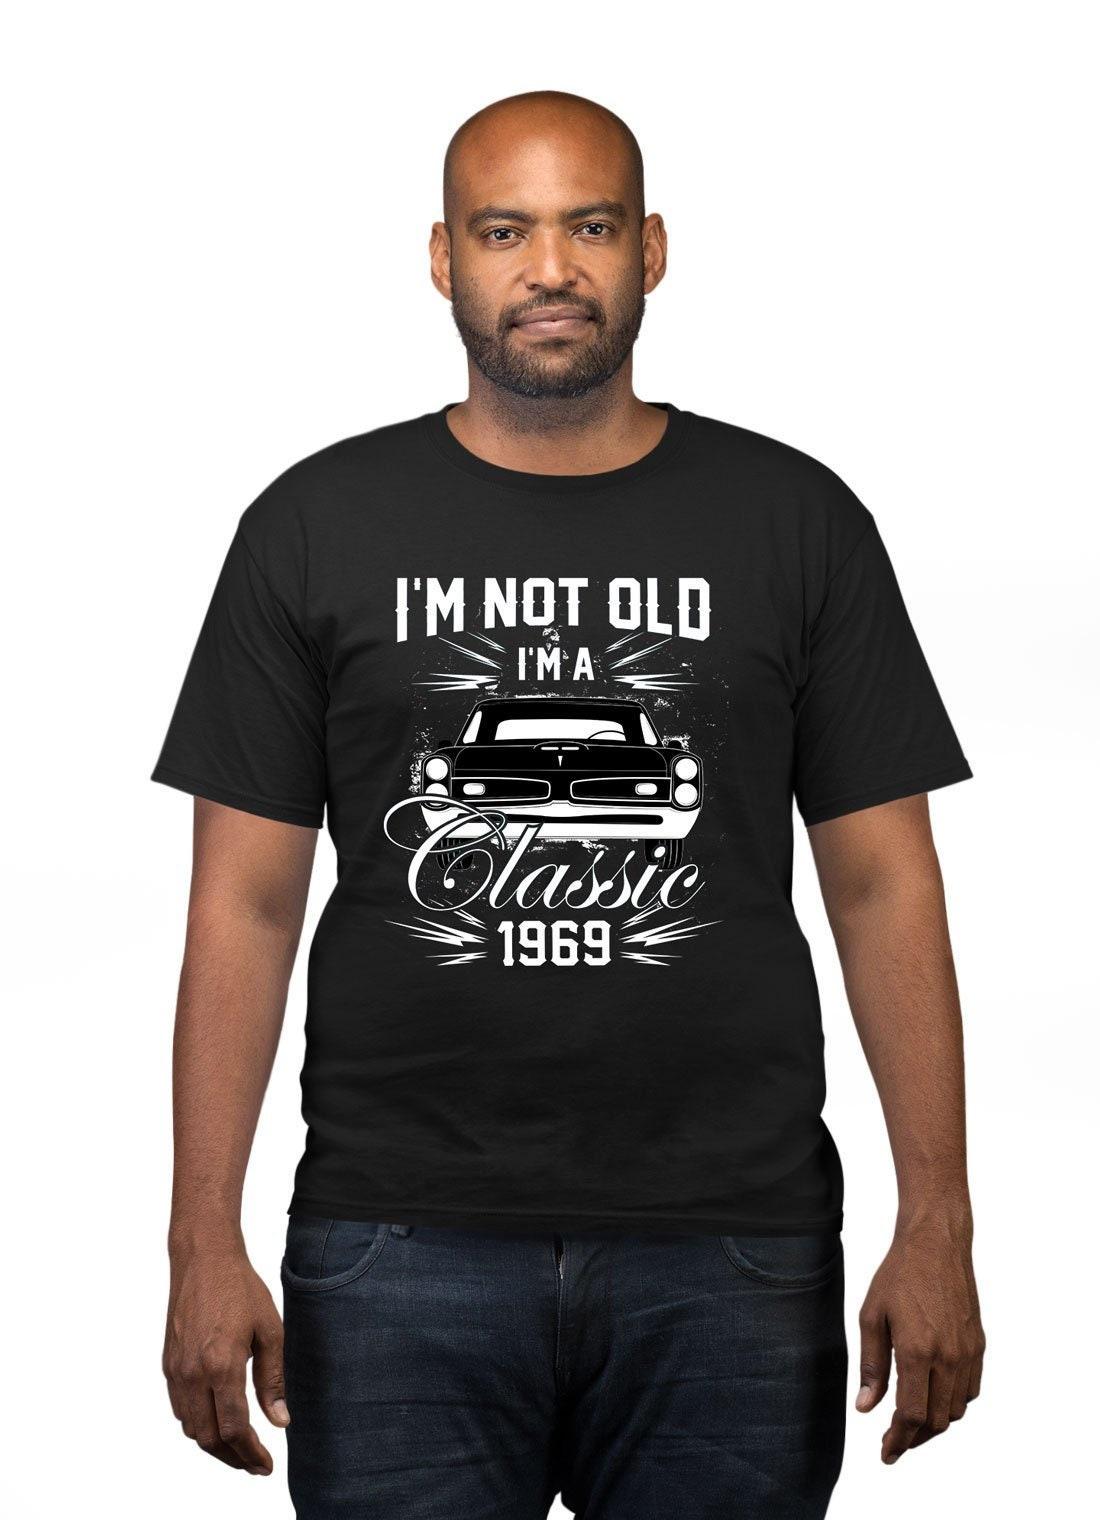 50th Birthday Shirt Dad Gift Ideas For Him Bday